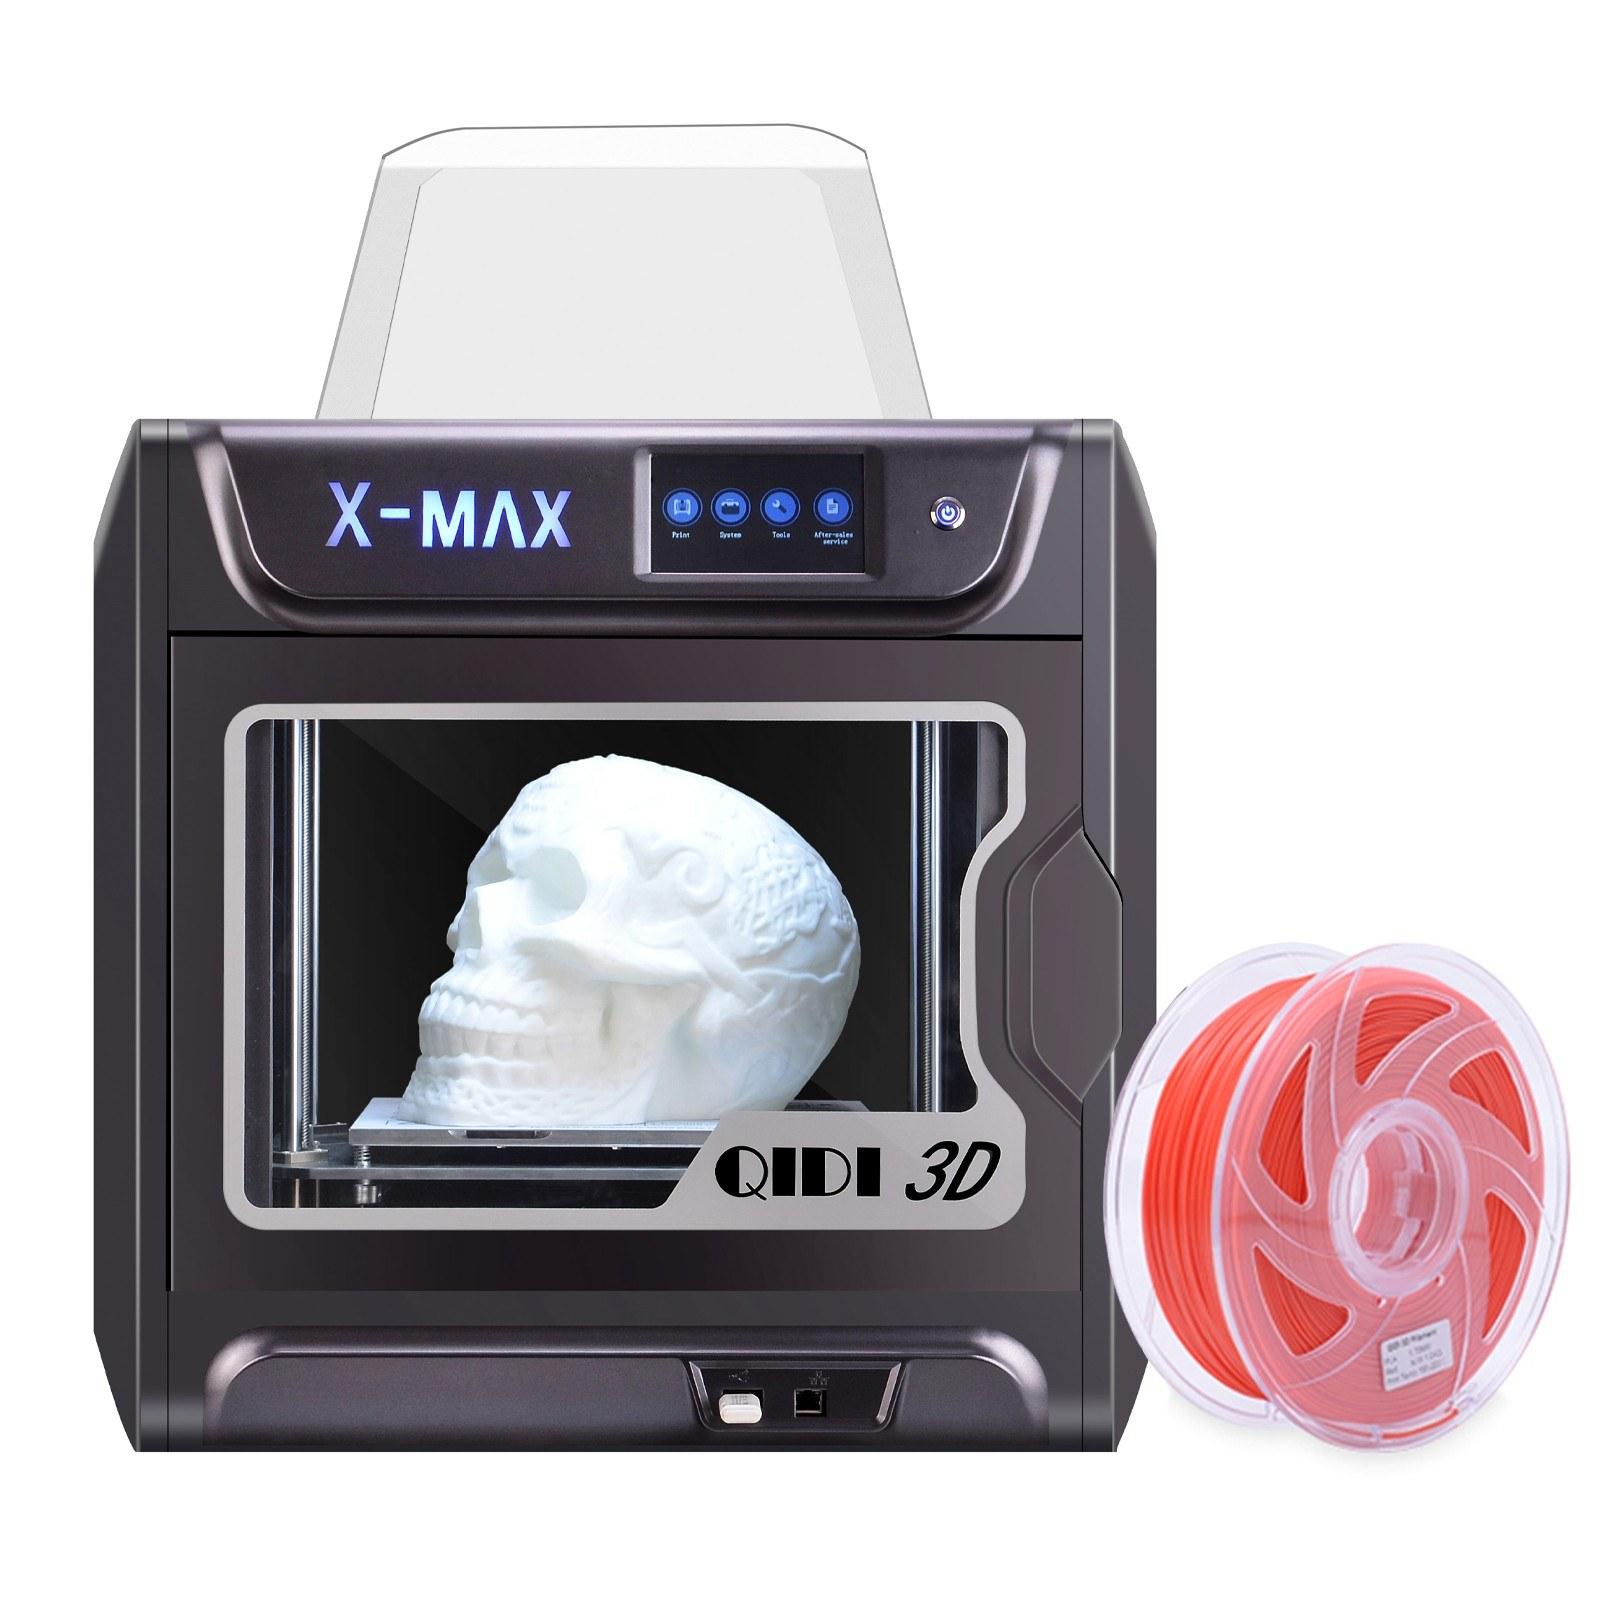 Tomtop - 50% OFF QIDI TECH X-MAX Industrial Grade 3D Printer, Free Shipping $1016.99